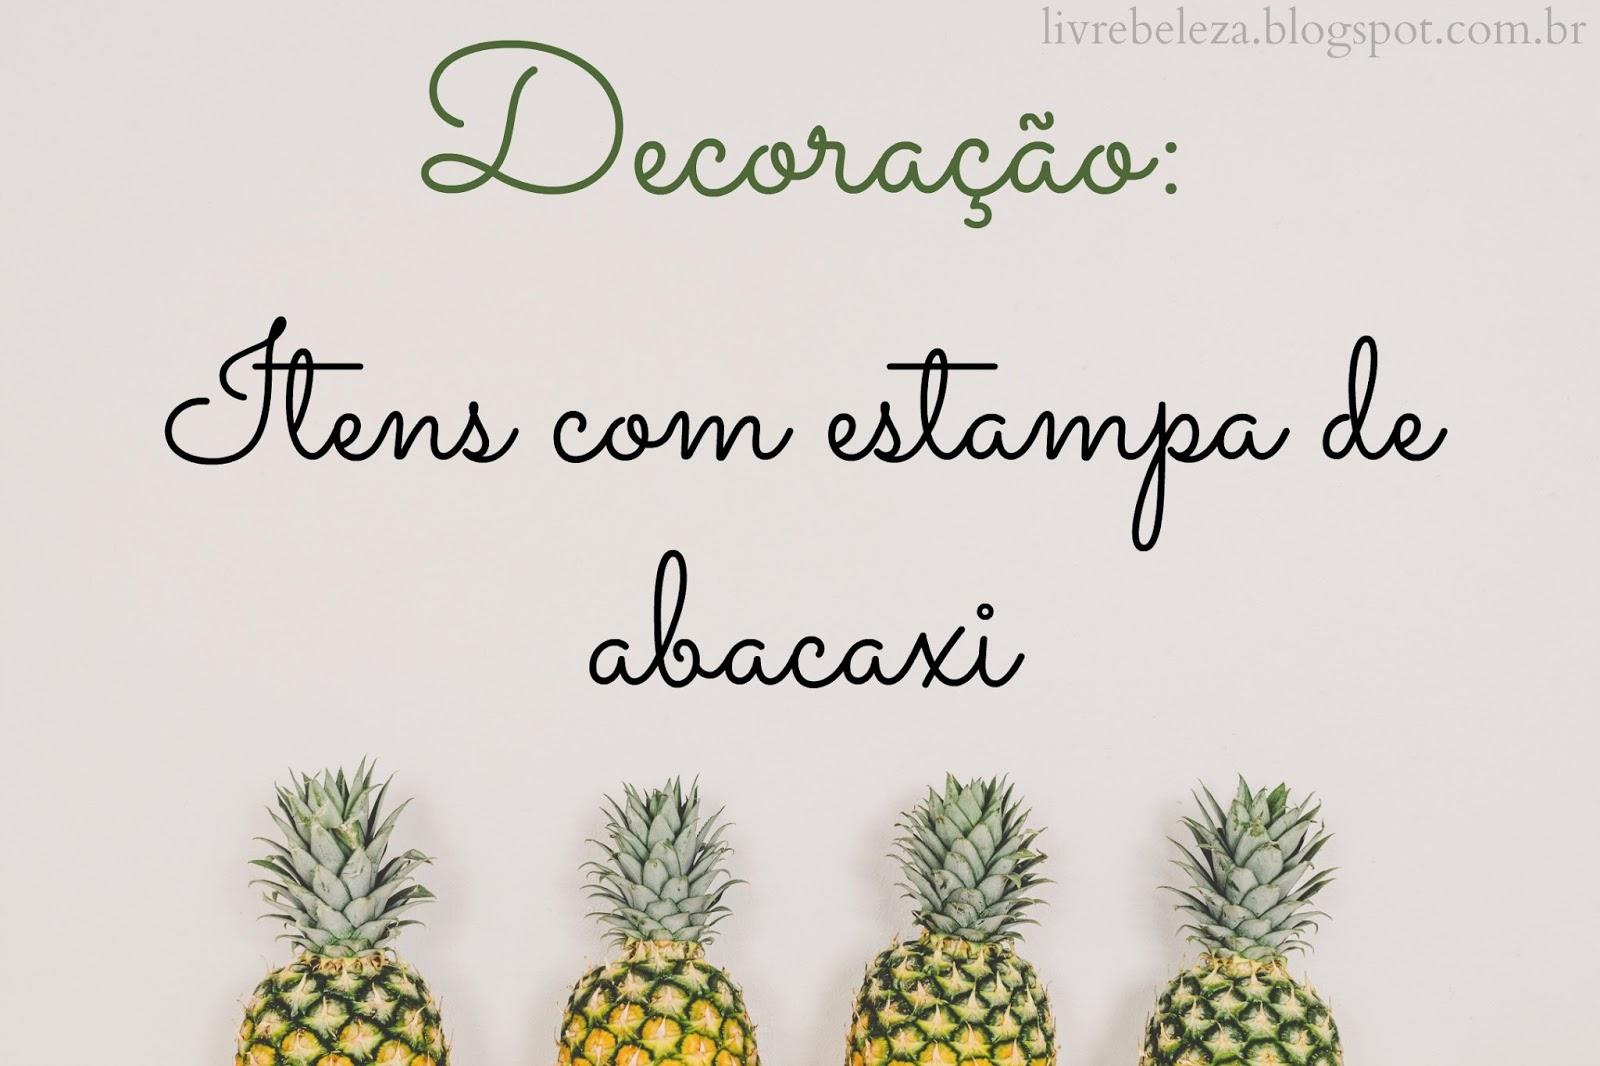 decoraçao-itens-abacaxi-estampa